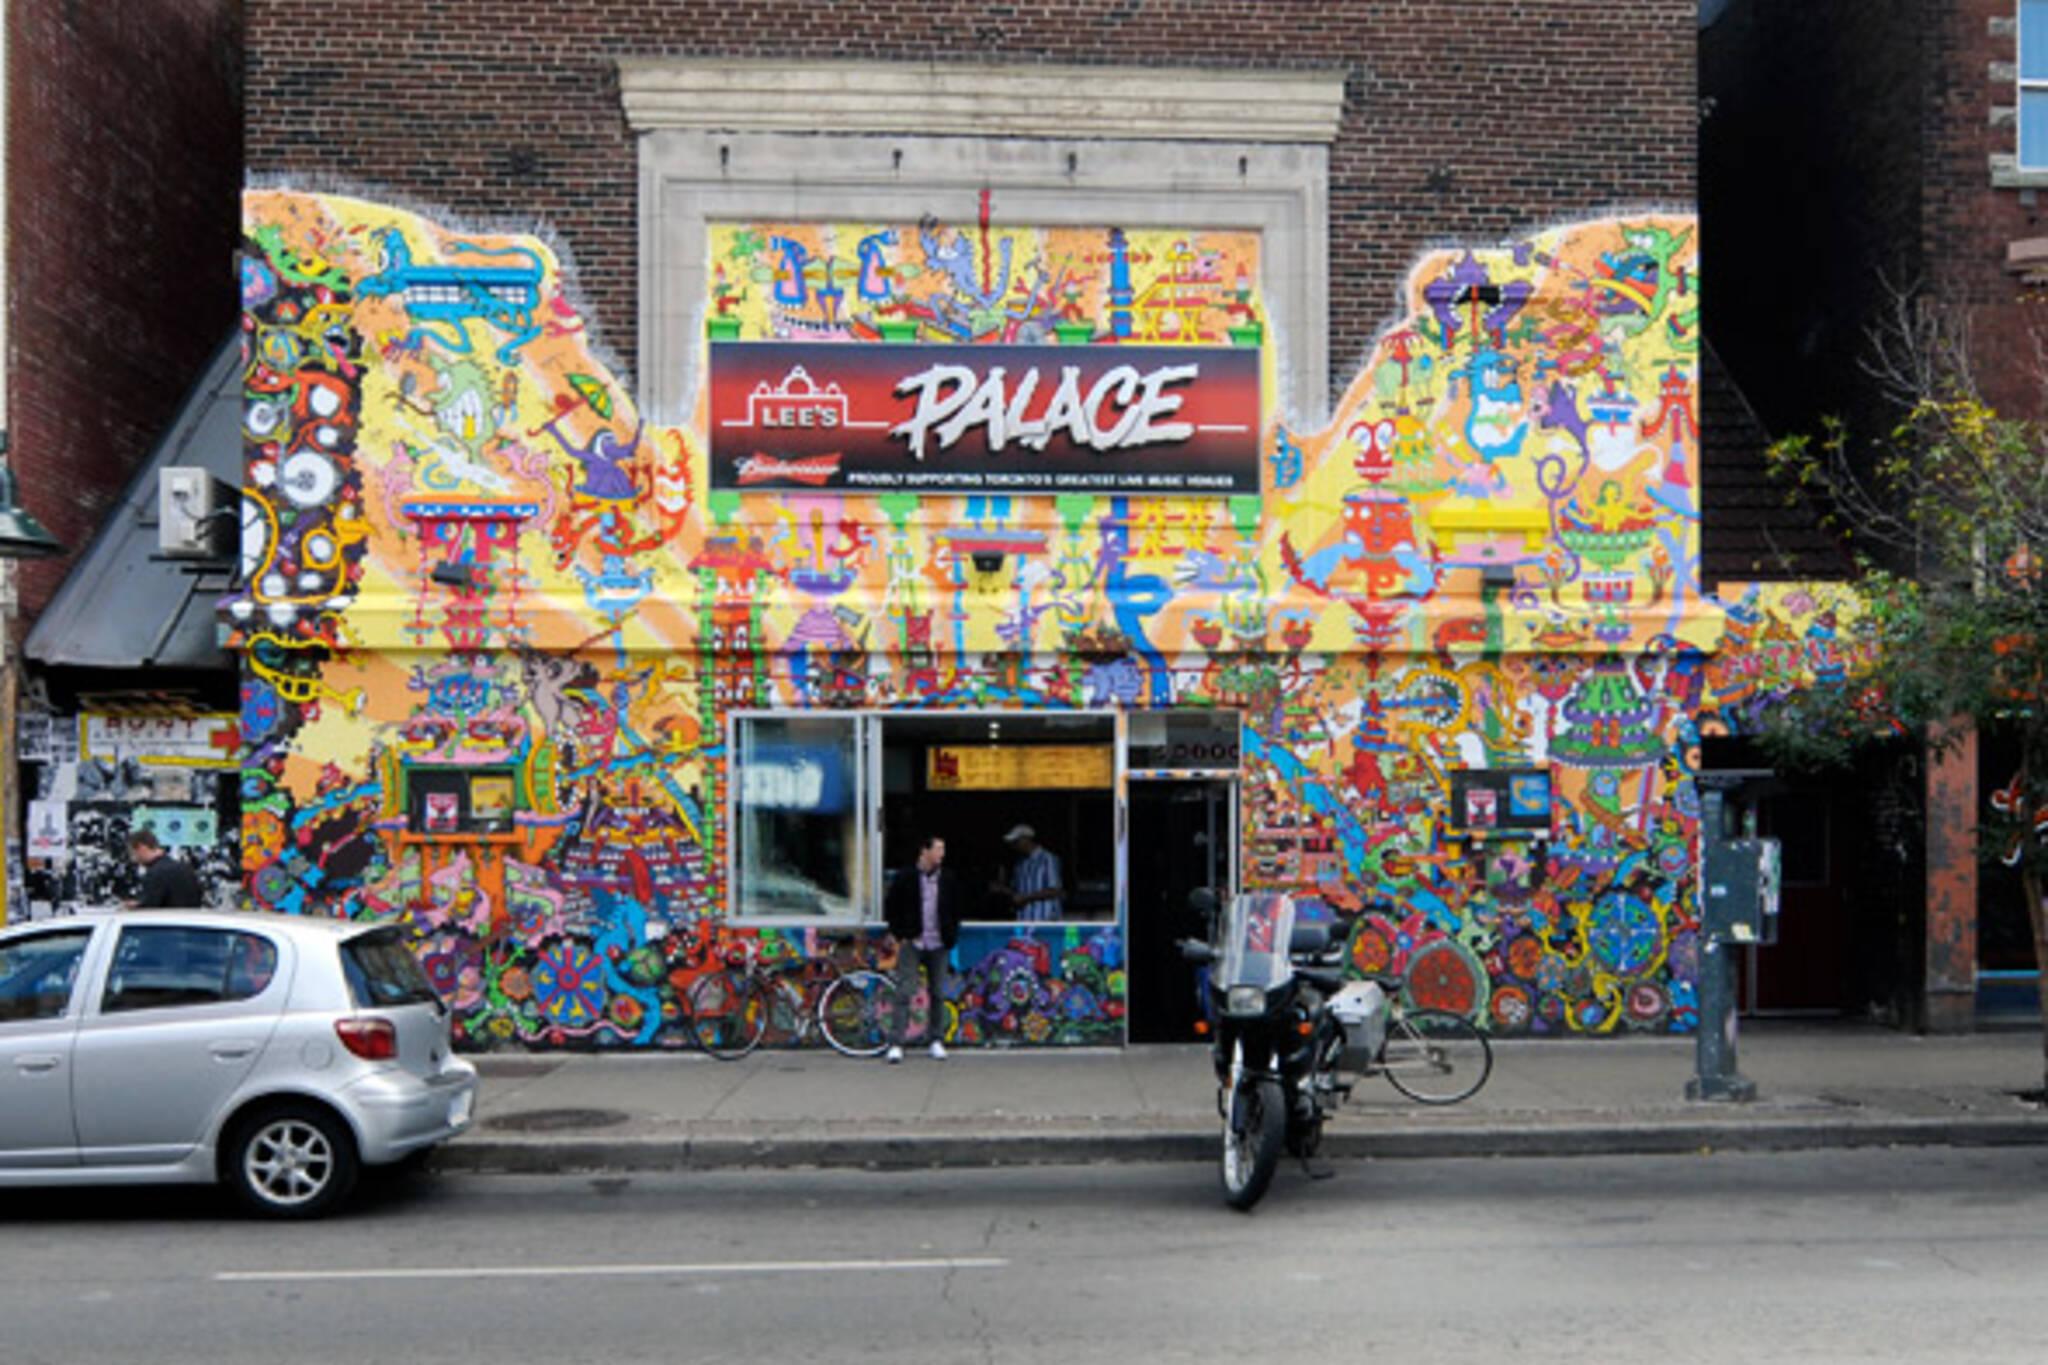 Lee's Palace Toronto